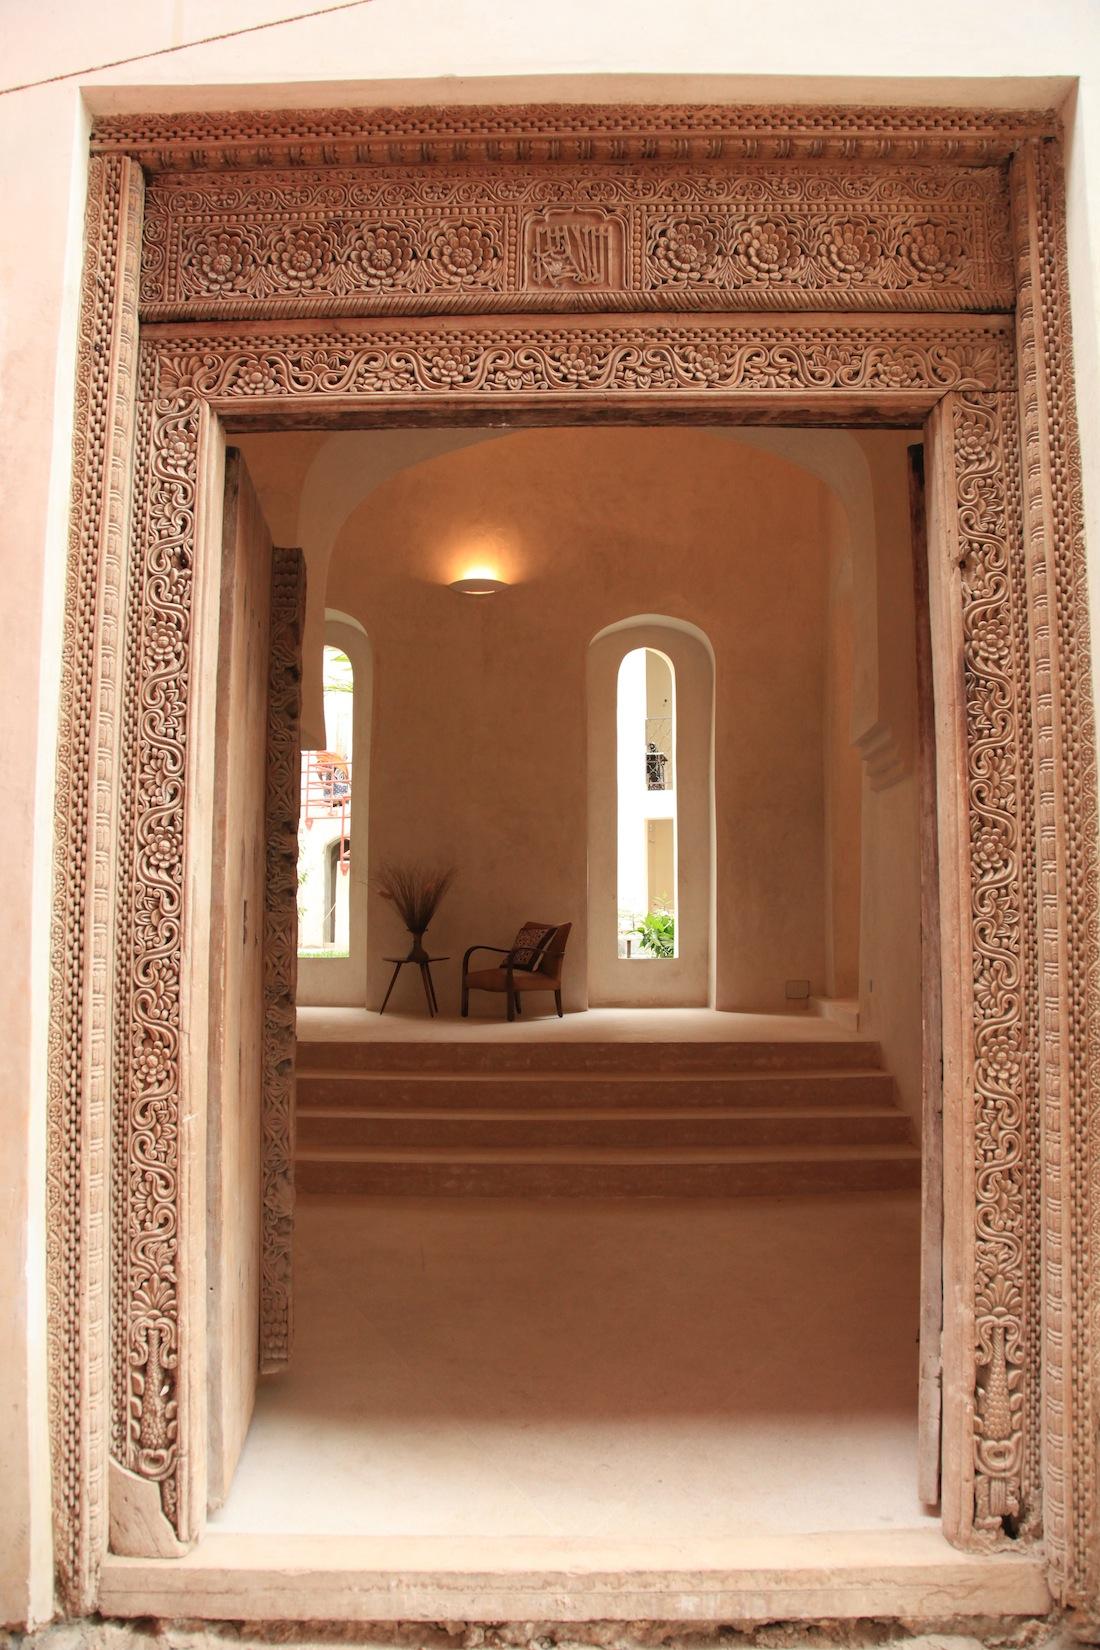 Mashariki-palace-hotel-zanzibar-stone-town-chambres-rooms-10